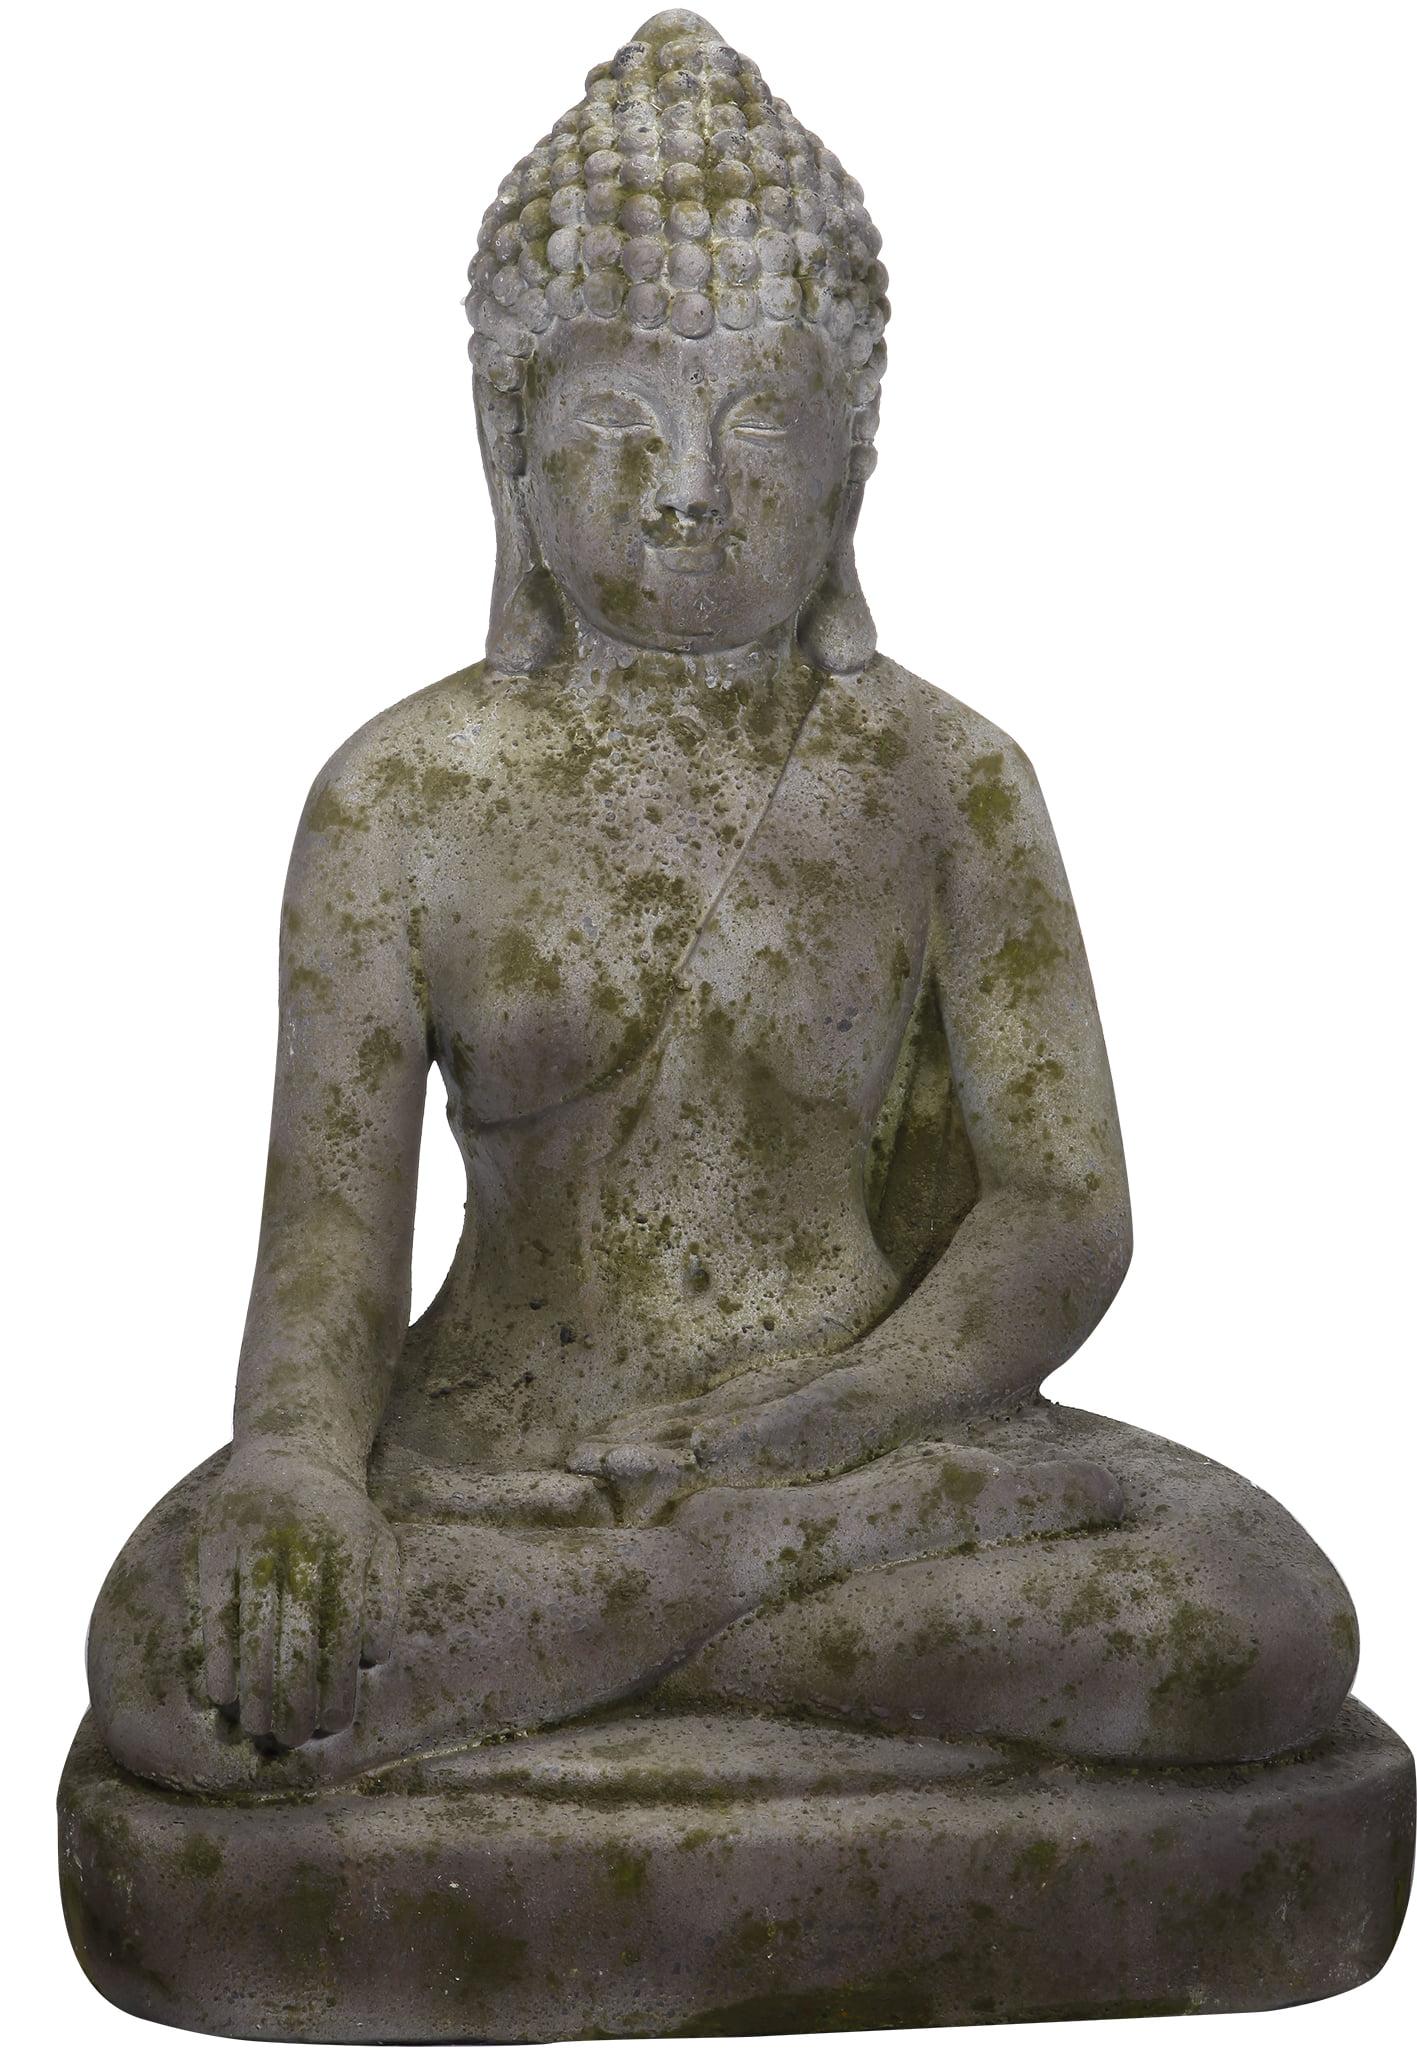 A&B Home Sitting Buddha Statue by A&B Home